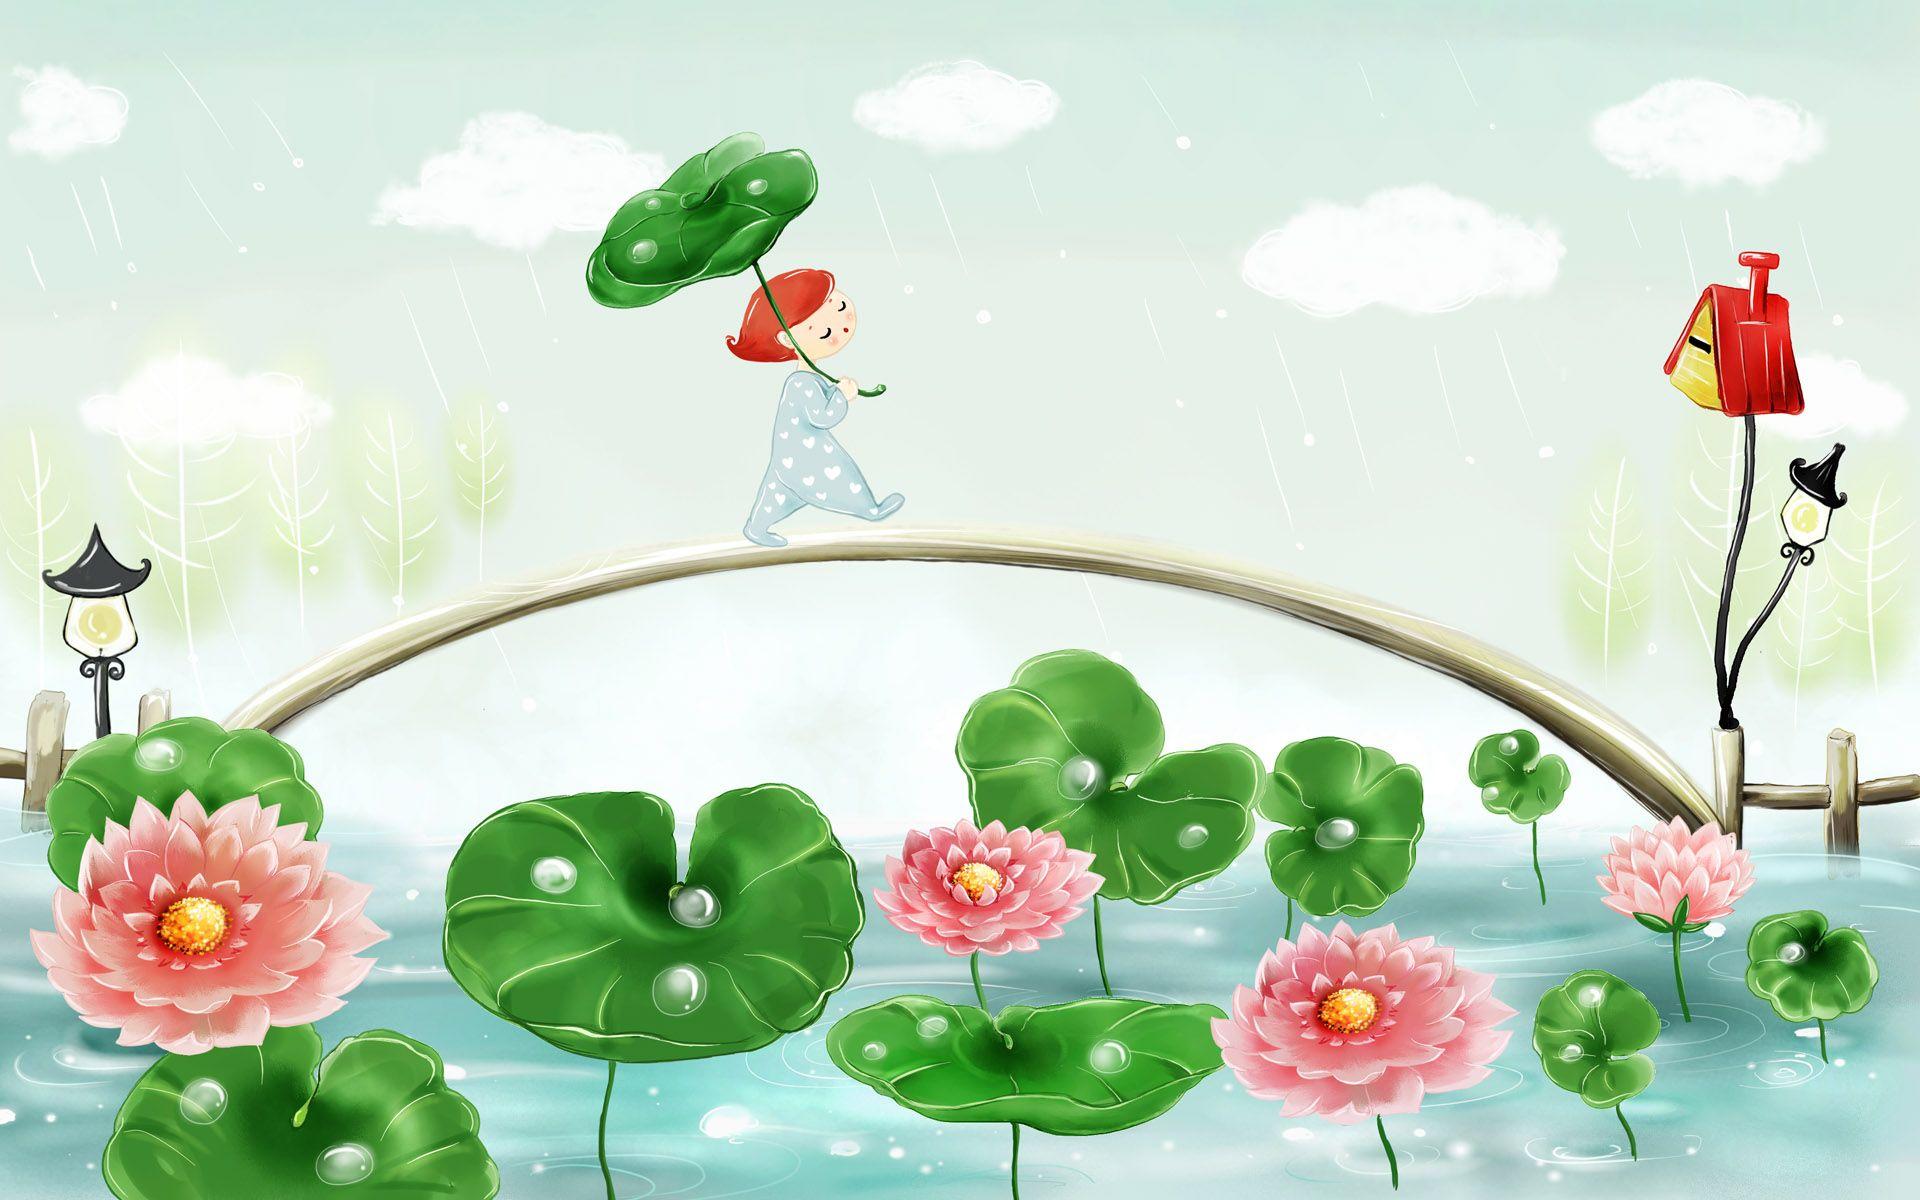 Hd wallpaper kawaii - Cartoon Animated Wallpapers Find Best Latest Cartoon Animated Wallpapers In Hd For Your Pc Desktop